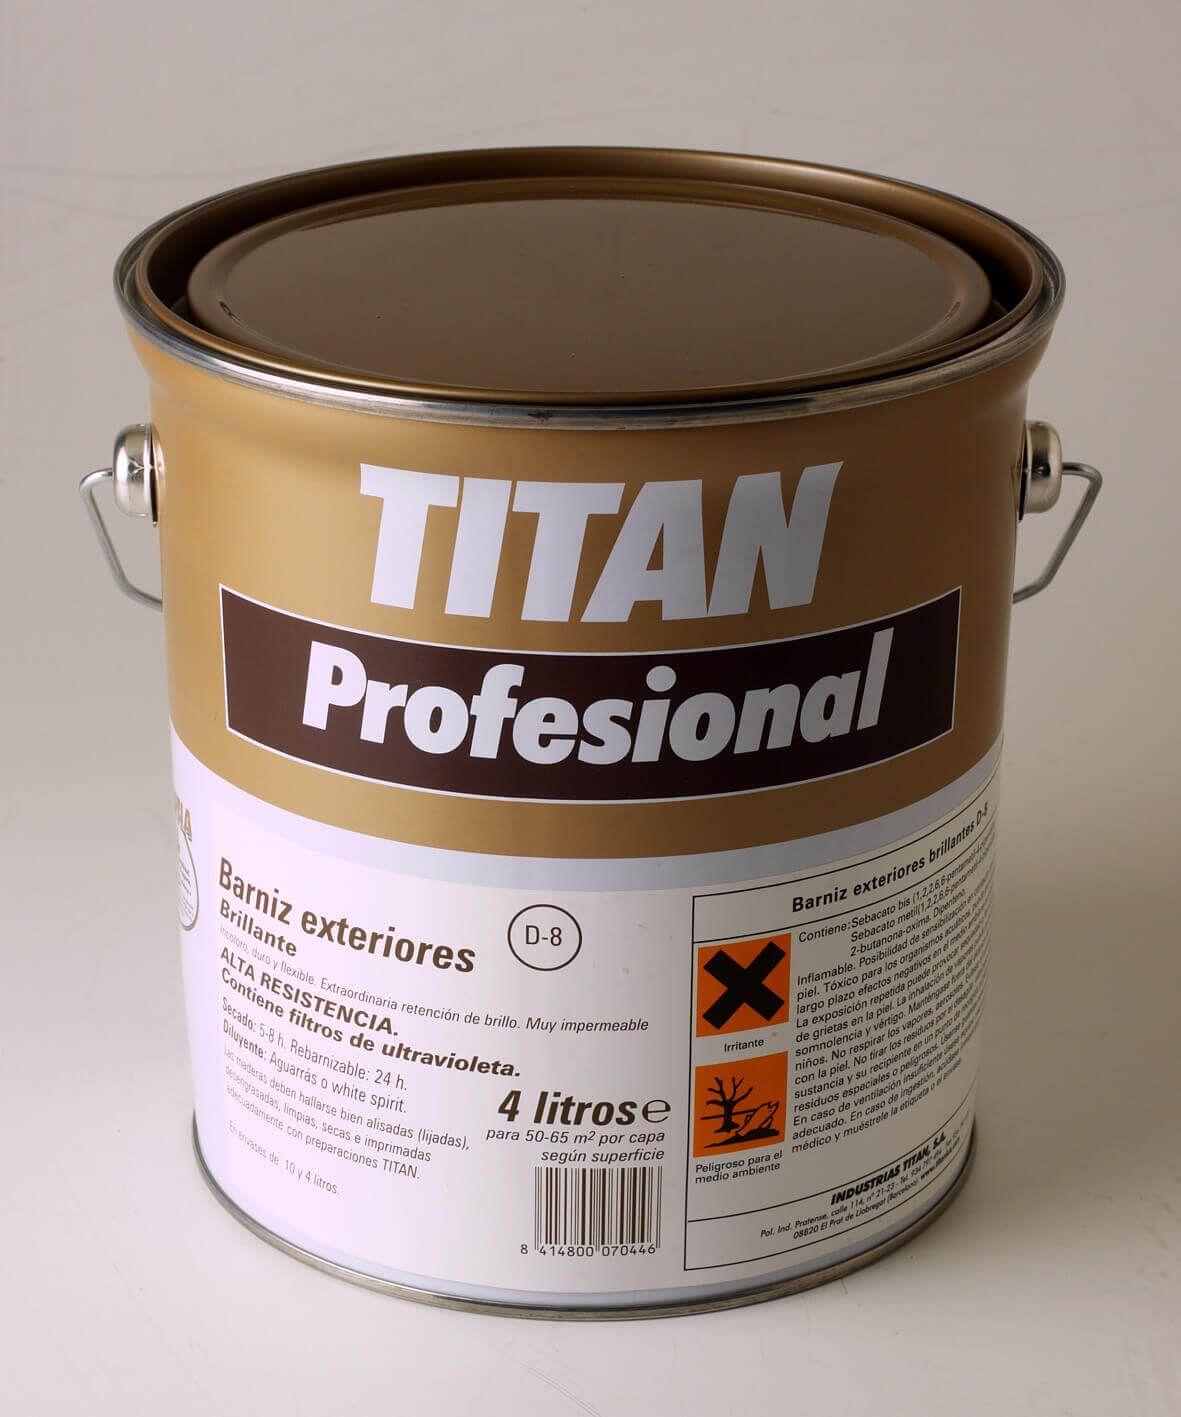 Barniz exteriores para madera titan compra online desde 6 for Pintura para madera